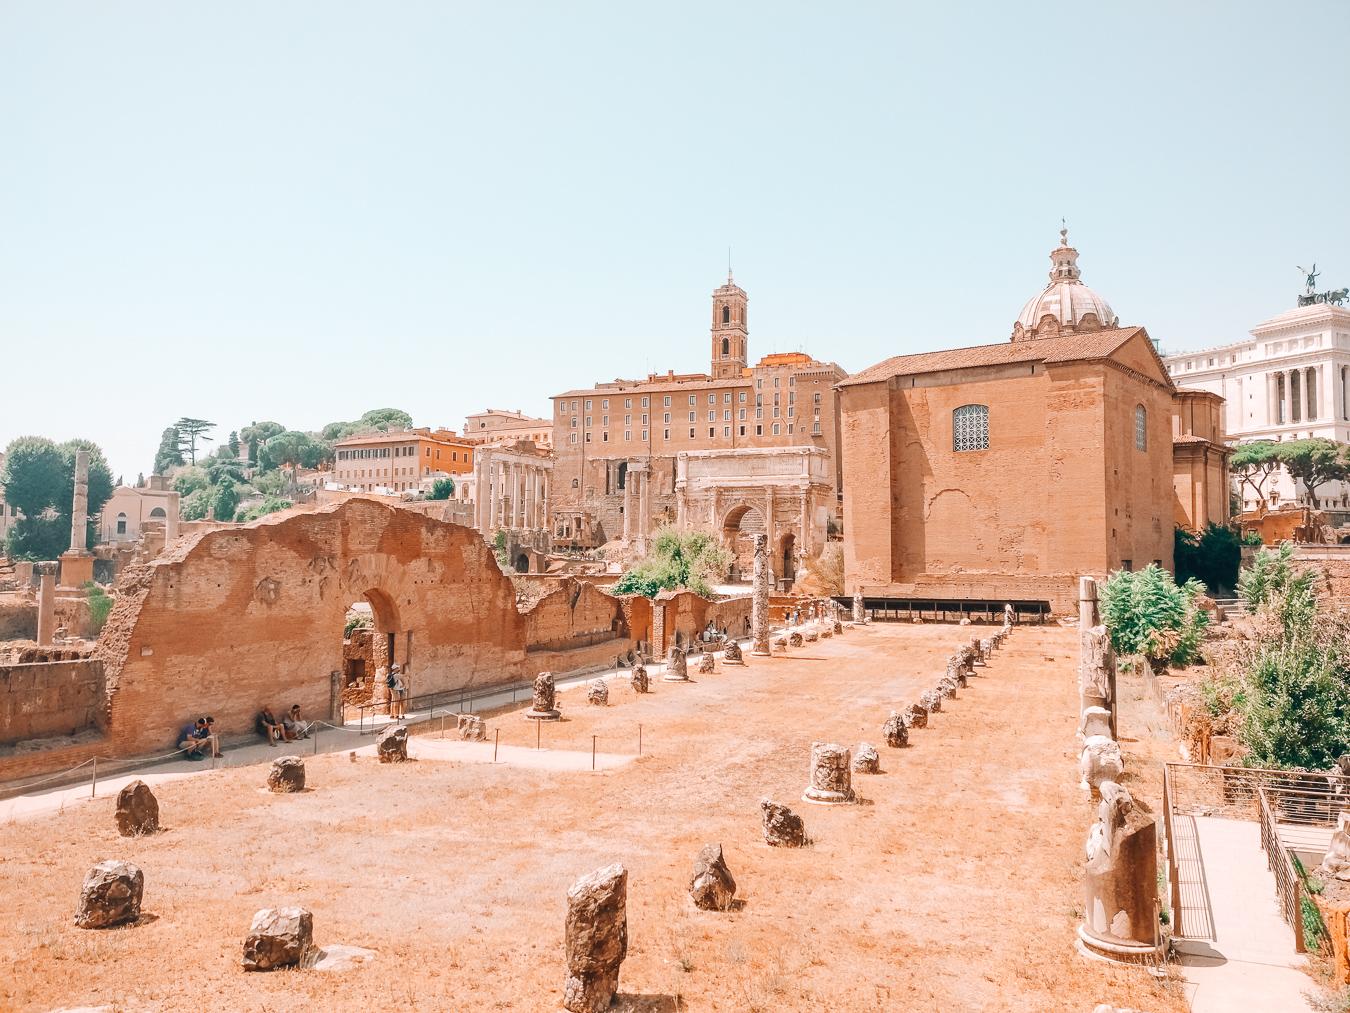 Ruins at Roman Forum